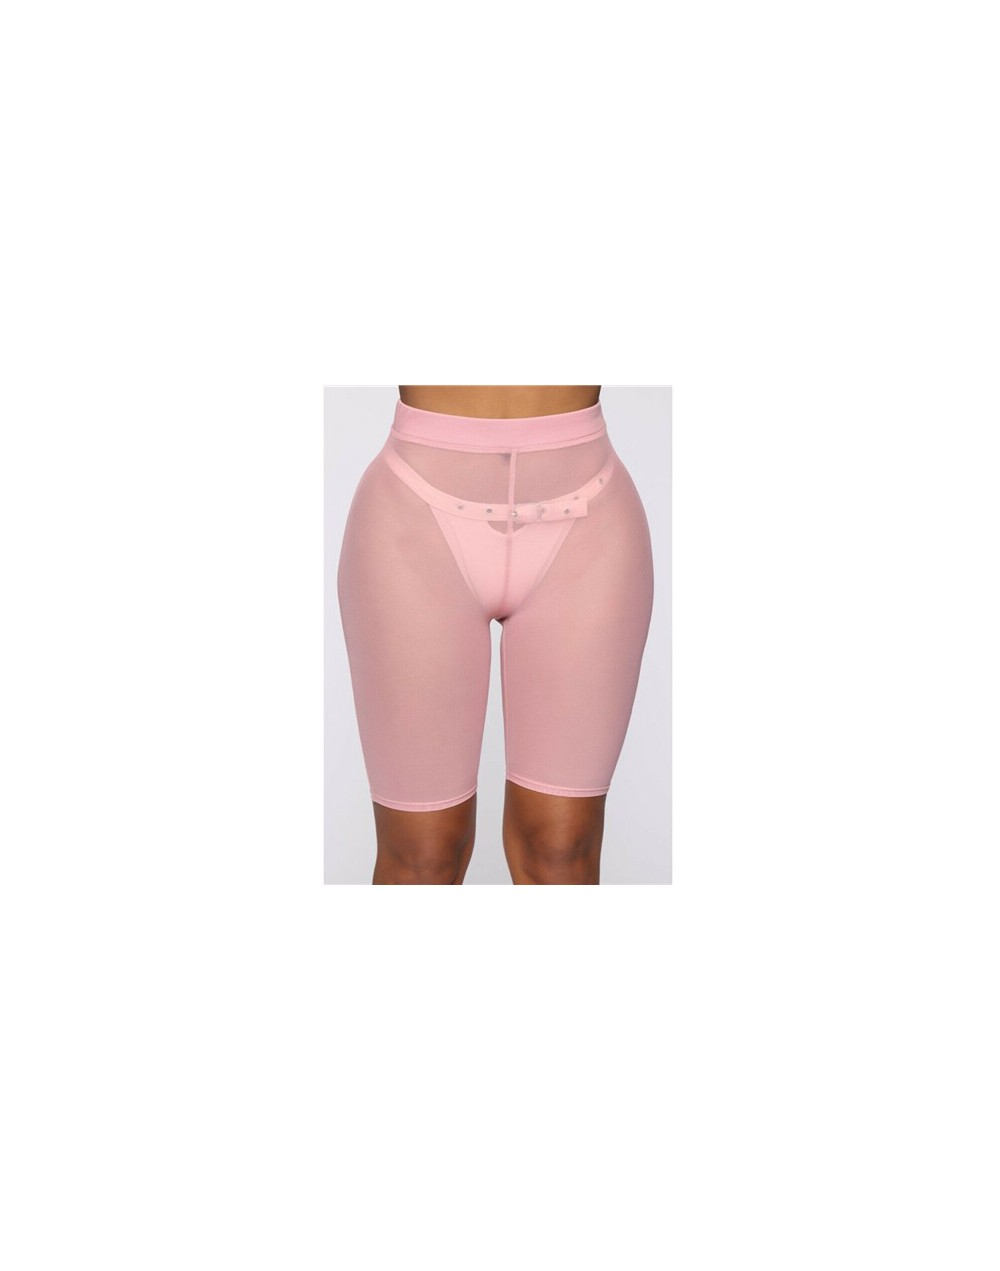 2019 Summer Hot Shorts Women Sexy See-through Slim Fit Mesh Elastic Sports Leggins High Waist Short Femme Perspective Shorts...